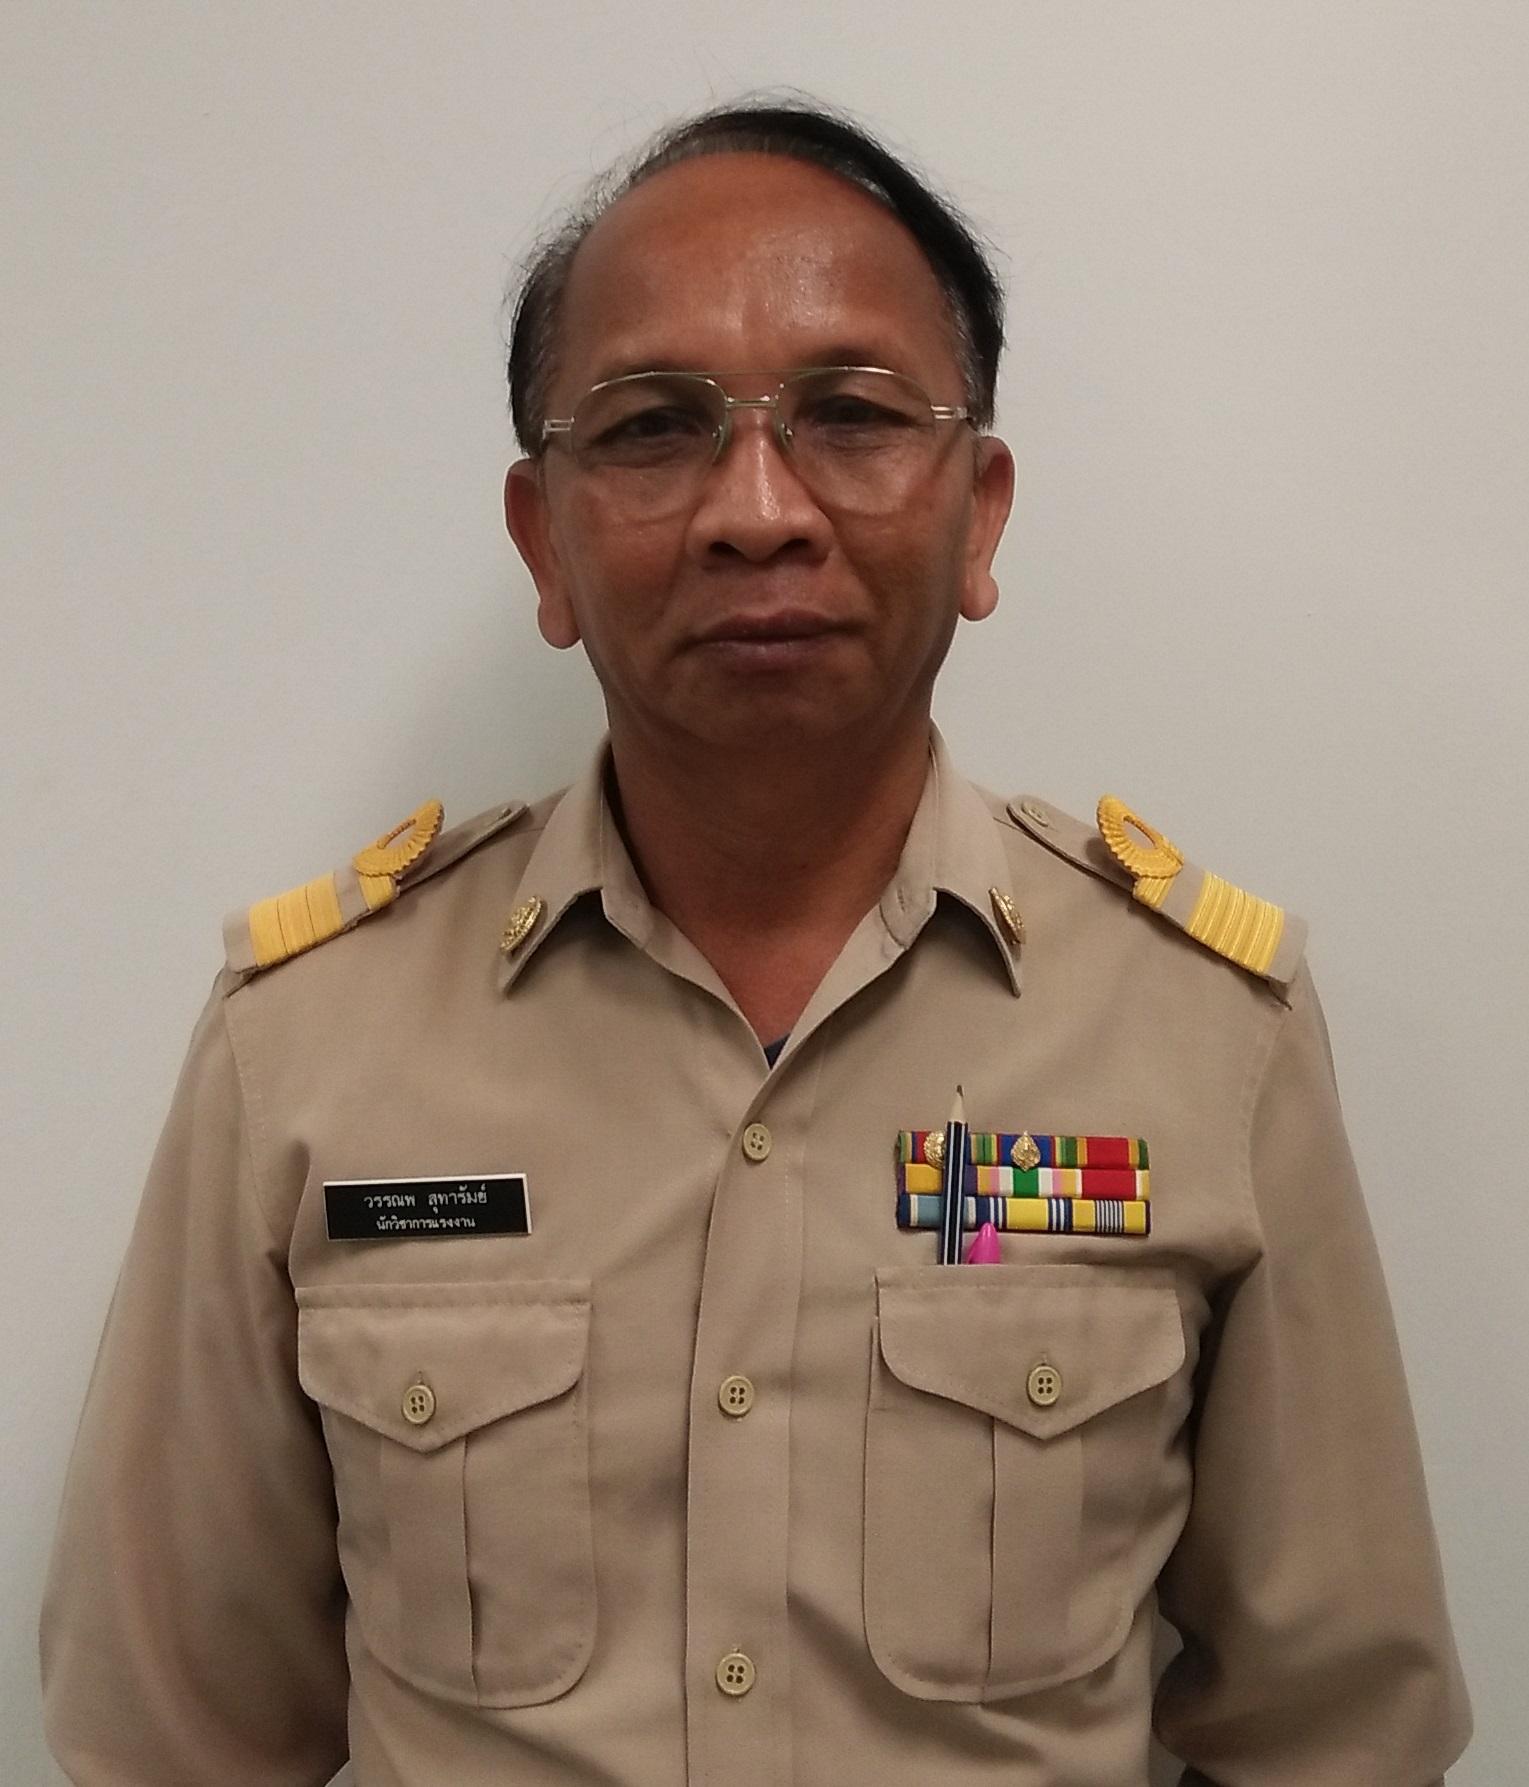 Mr Vannop Sutarum